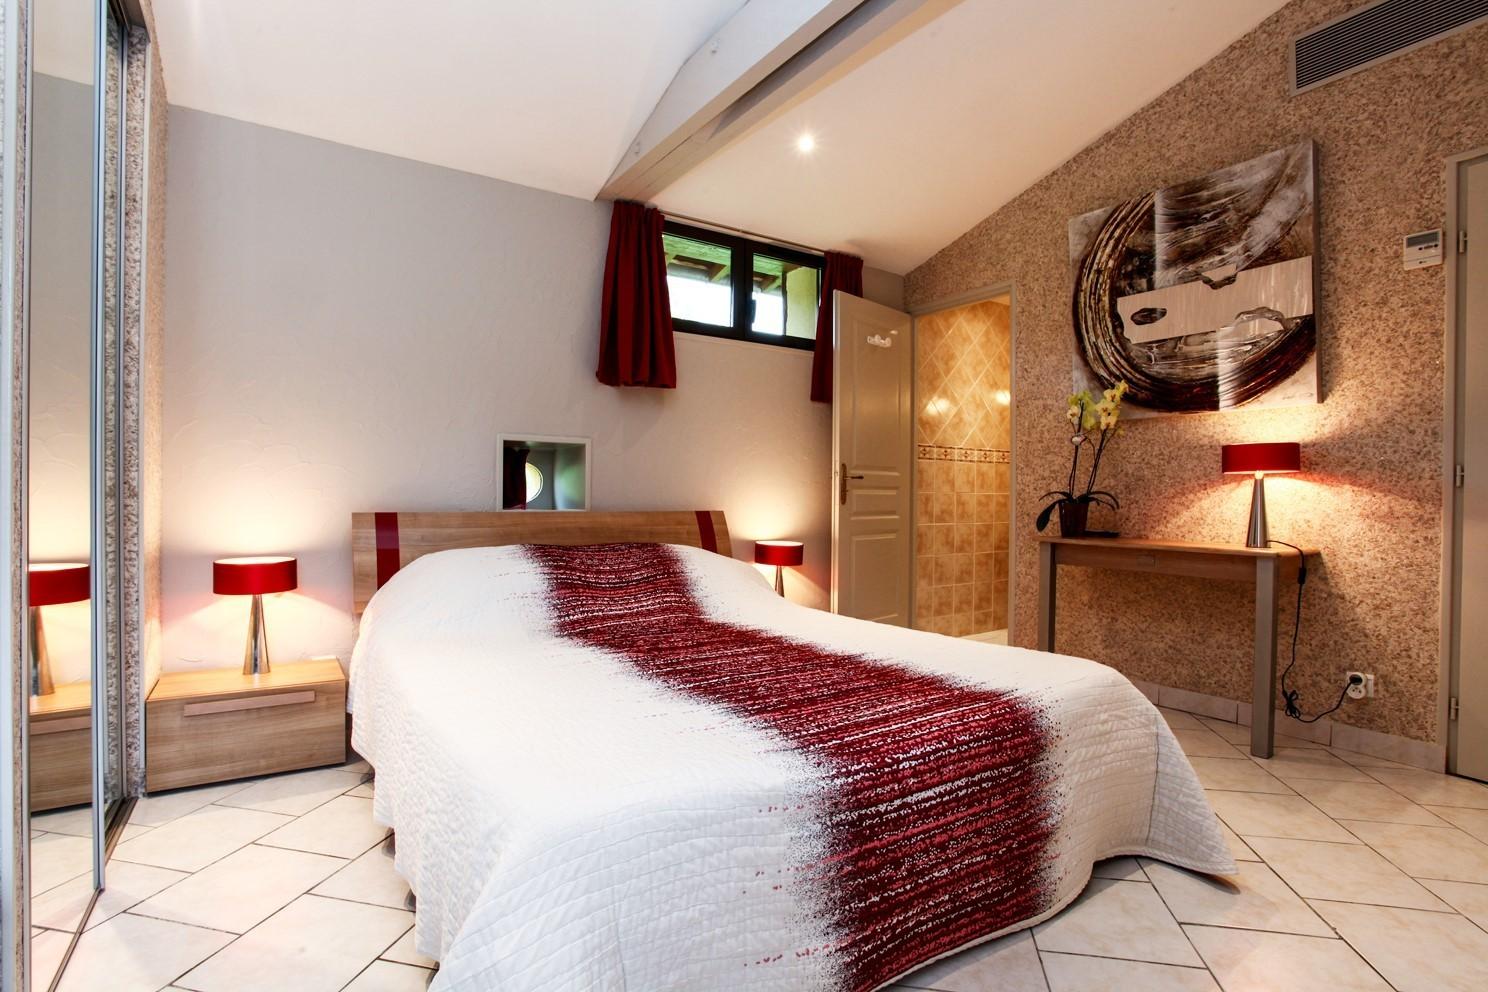 o louer une chambre petit prix sarlat louer chambre d 39 hotes. Black Bedroom Furniture Sets. Home Design Ideas